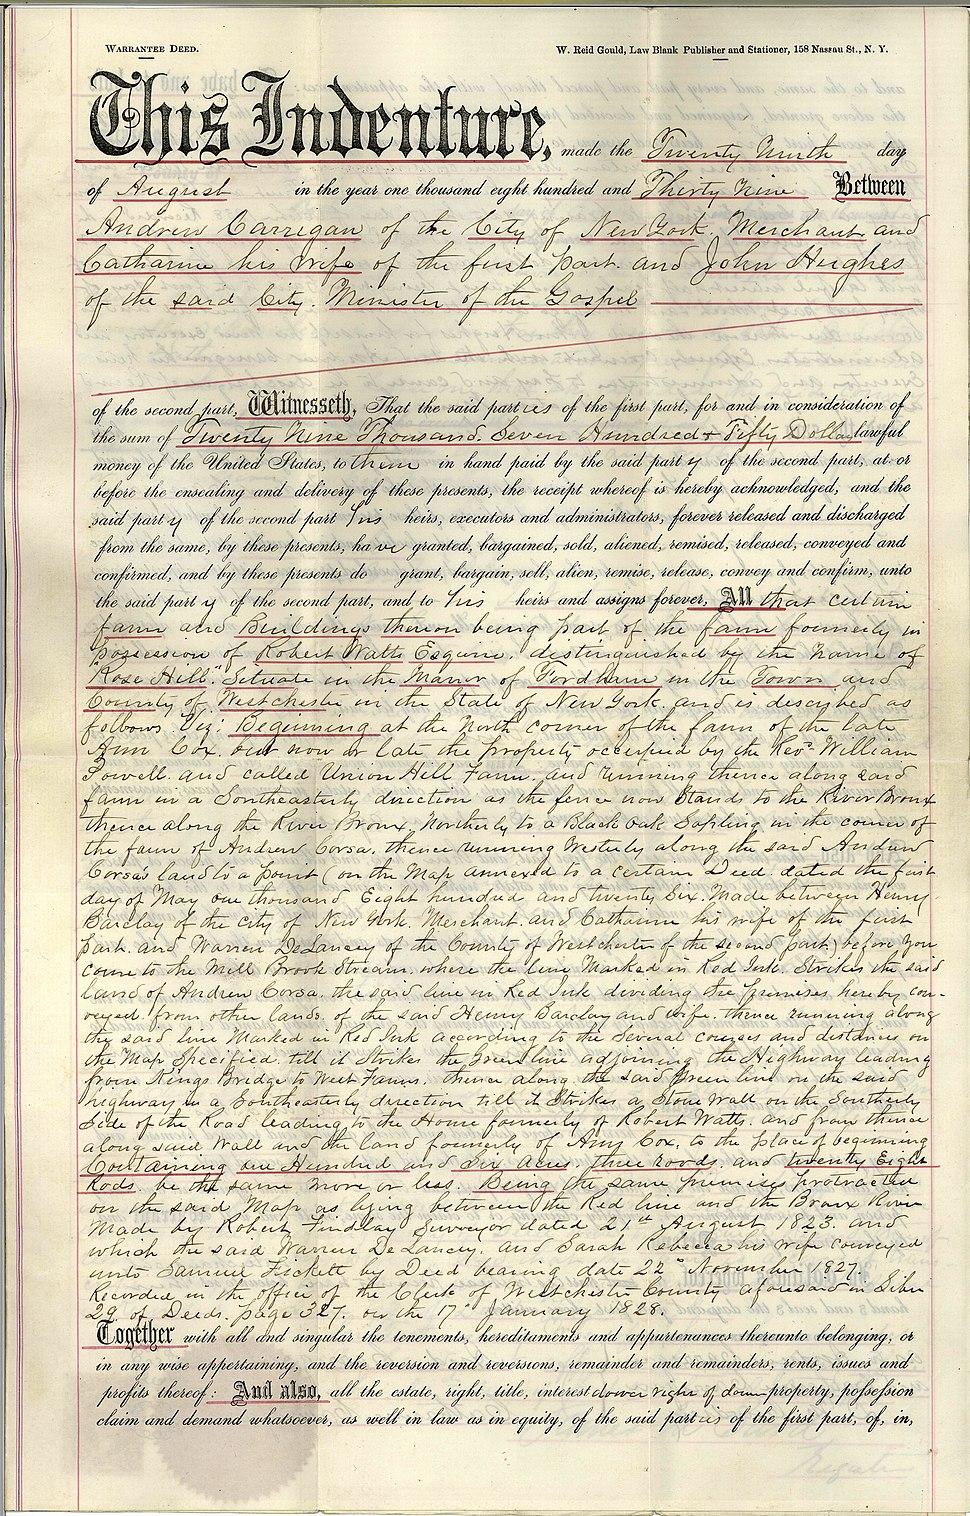 1839 Deed to St. John's College (Fordham University)